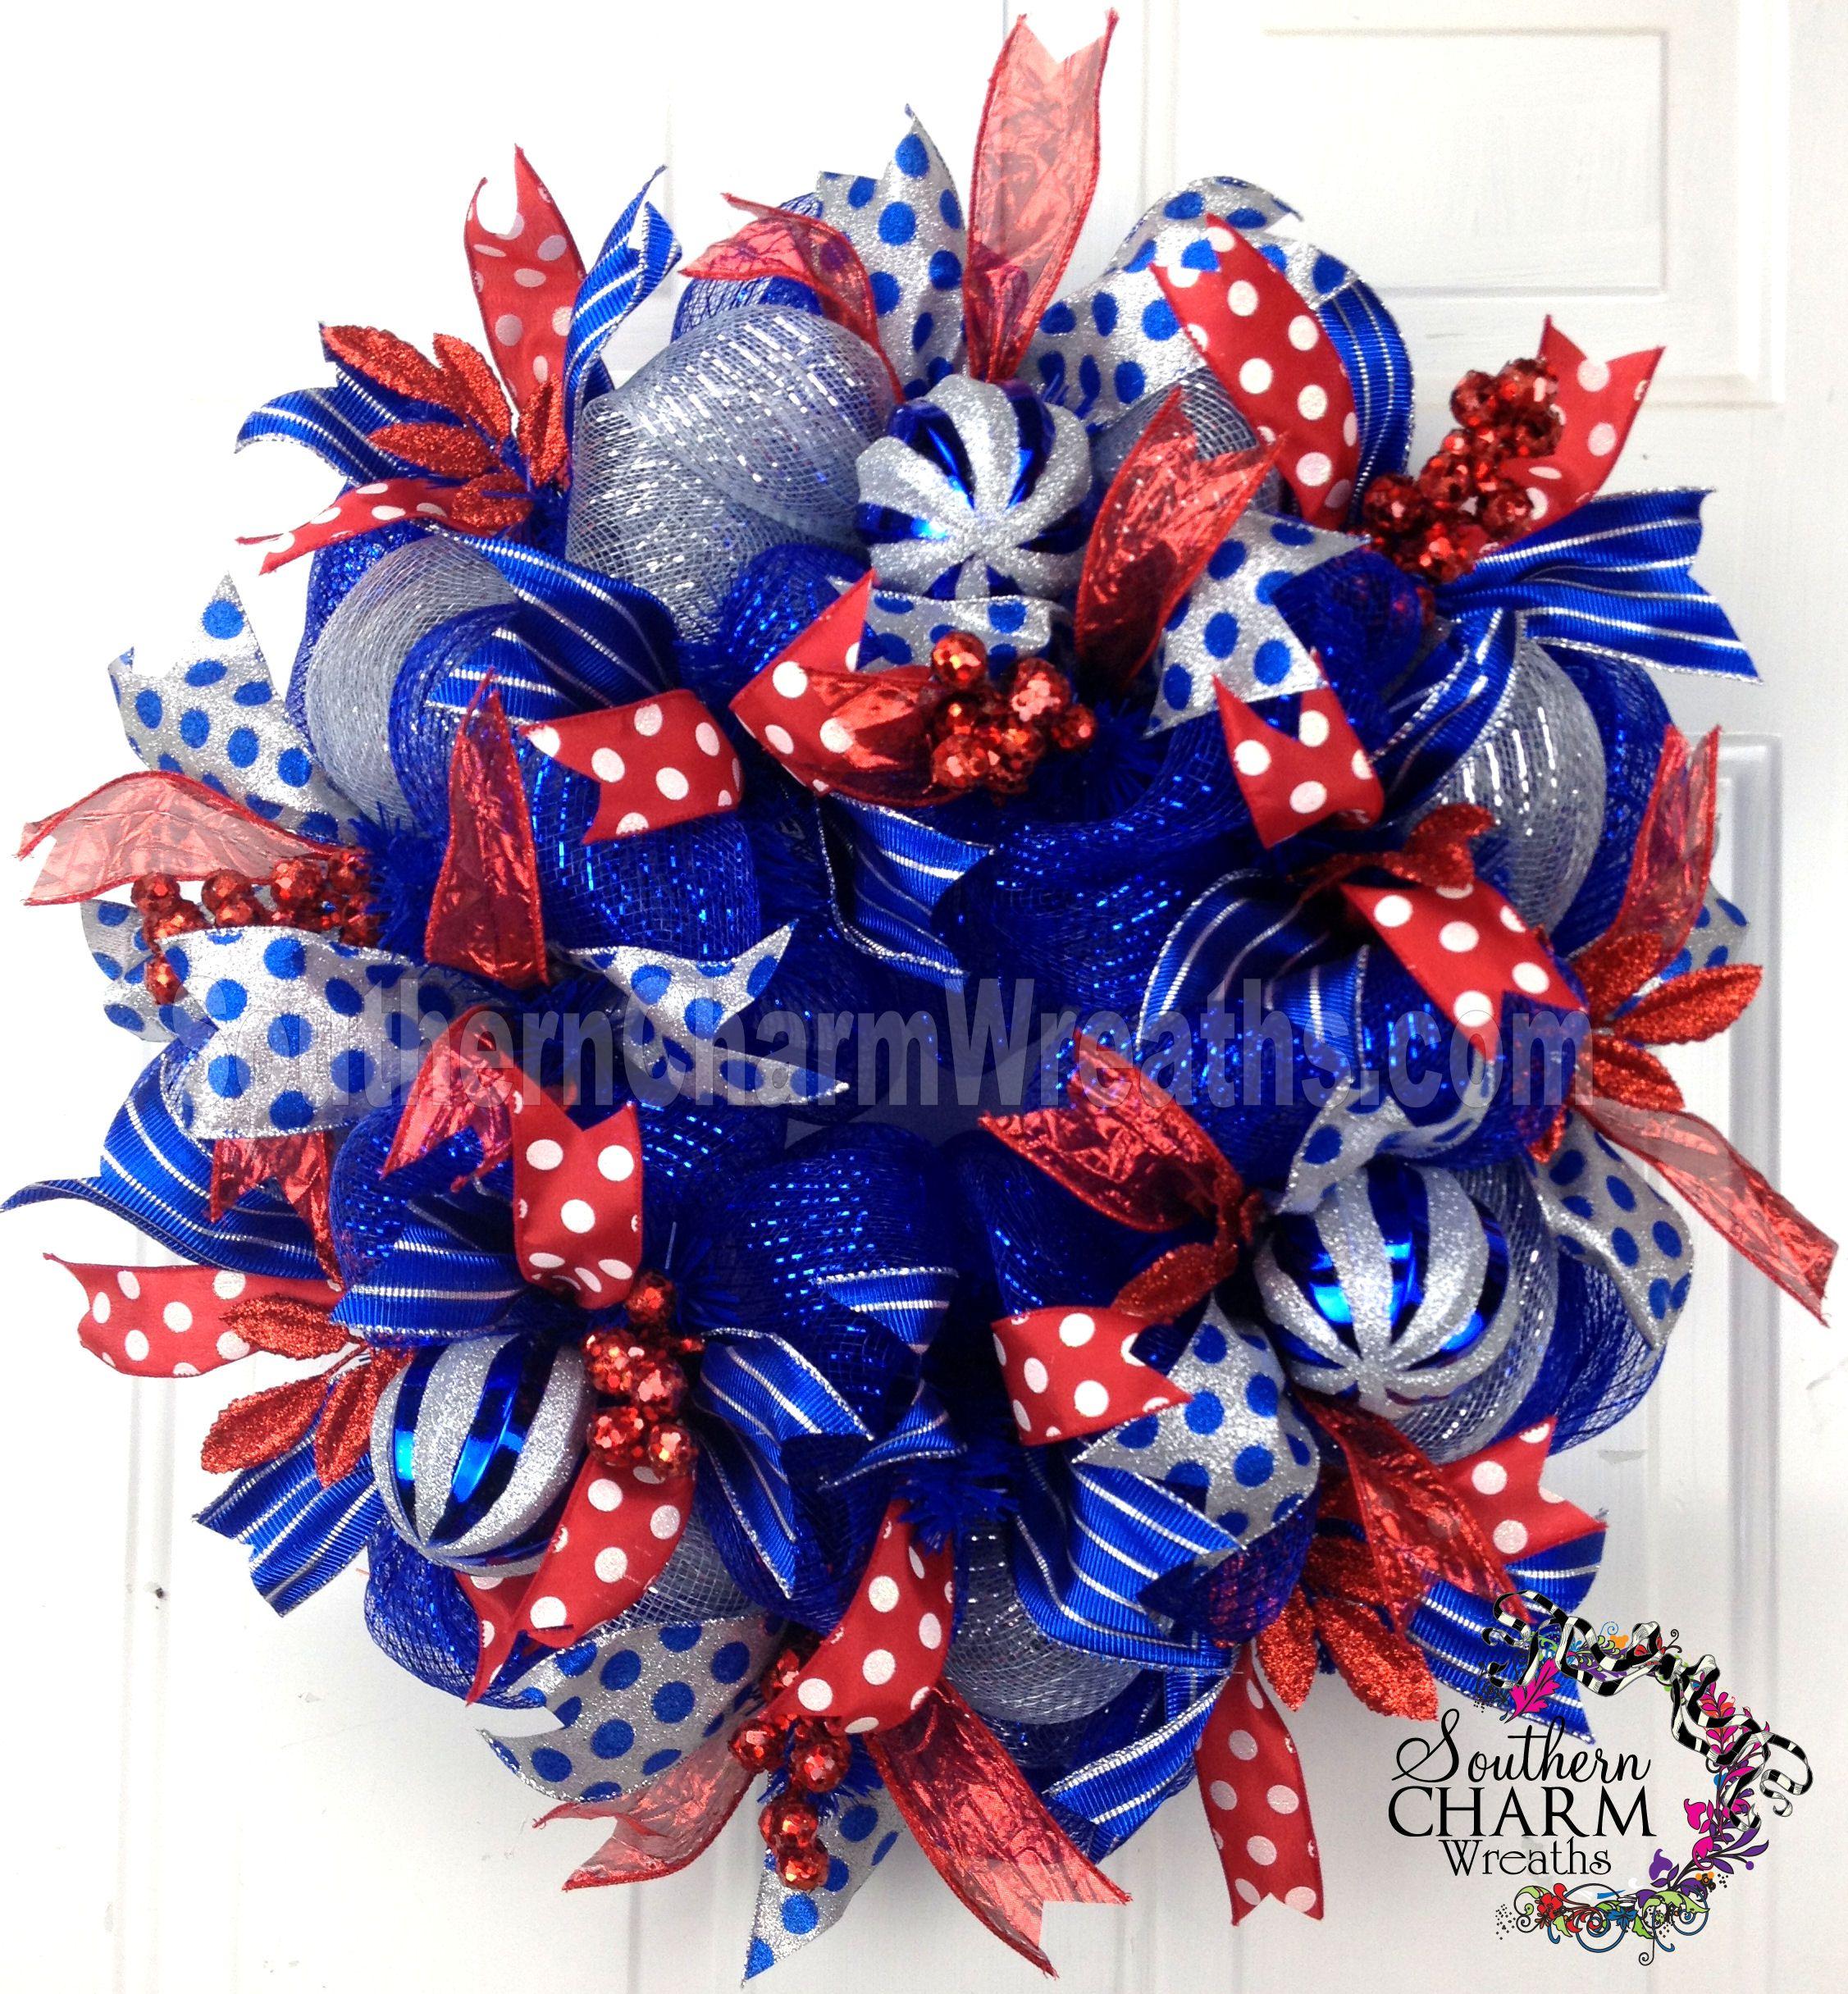 Deco mesh wreaths twist tie dilemma solved wreaths craft and deco mesh wreaths deco mesh wreaths twist tie dilemma solved baditri Gallery